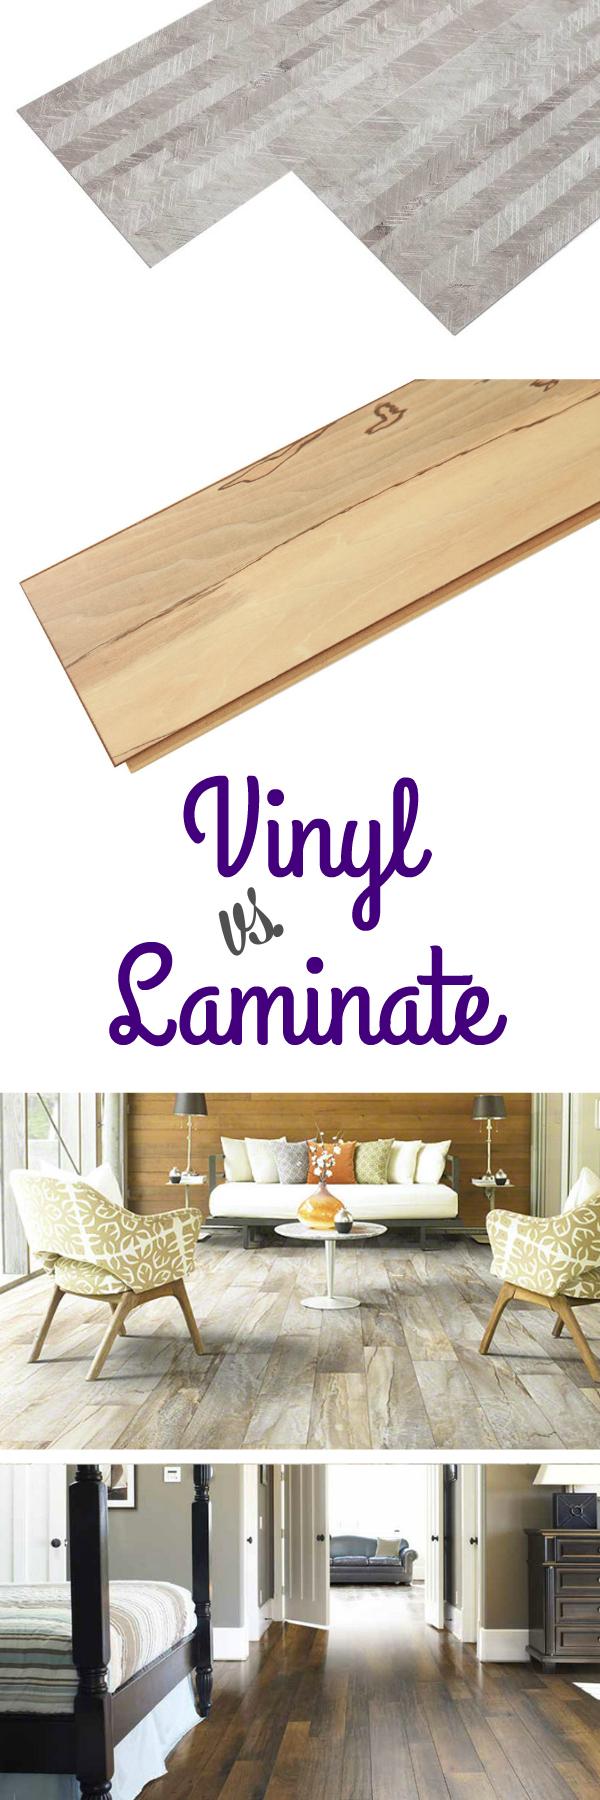 laminate vs vinyl flooring flooringinc blog. Black Bedroom Furniture Sets. Home Design Ideas